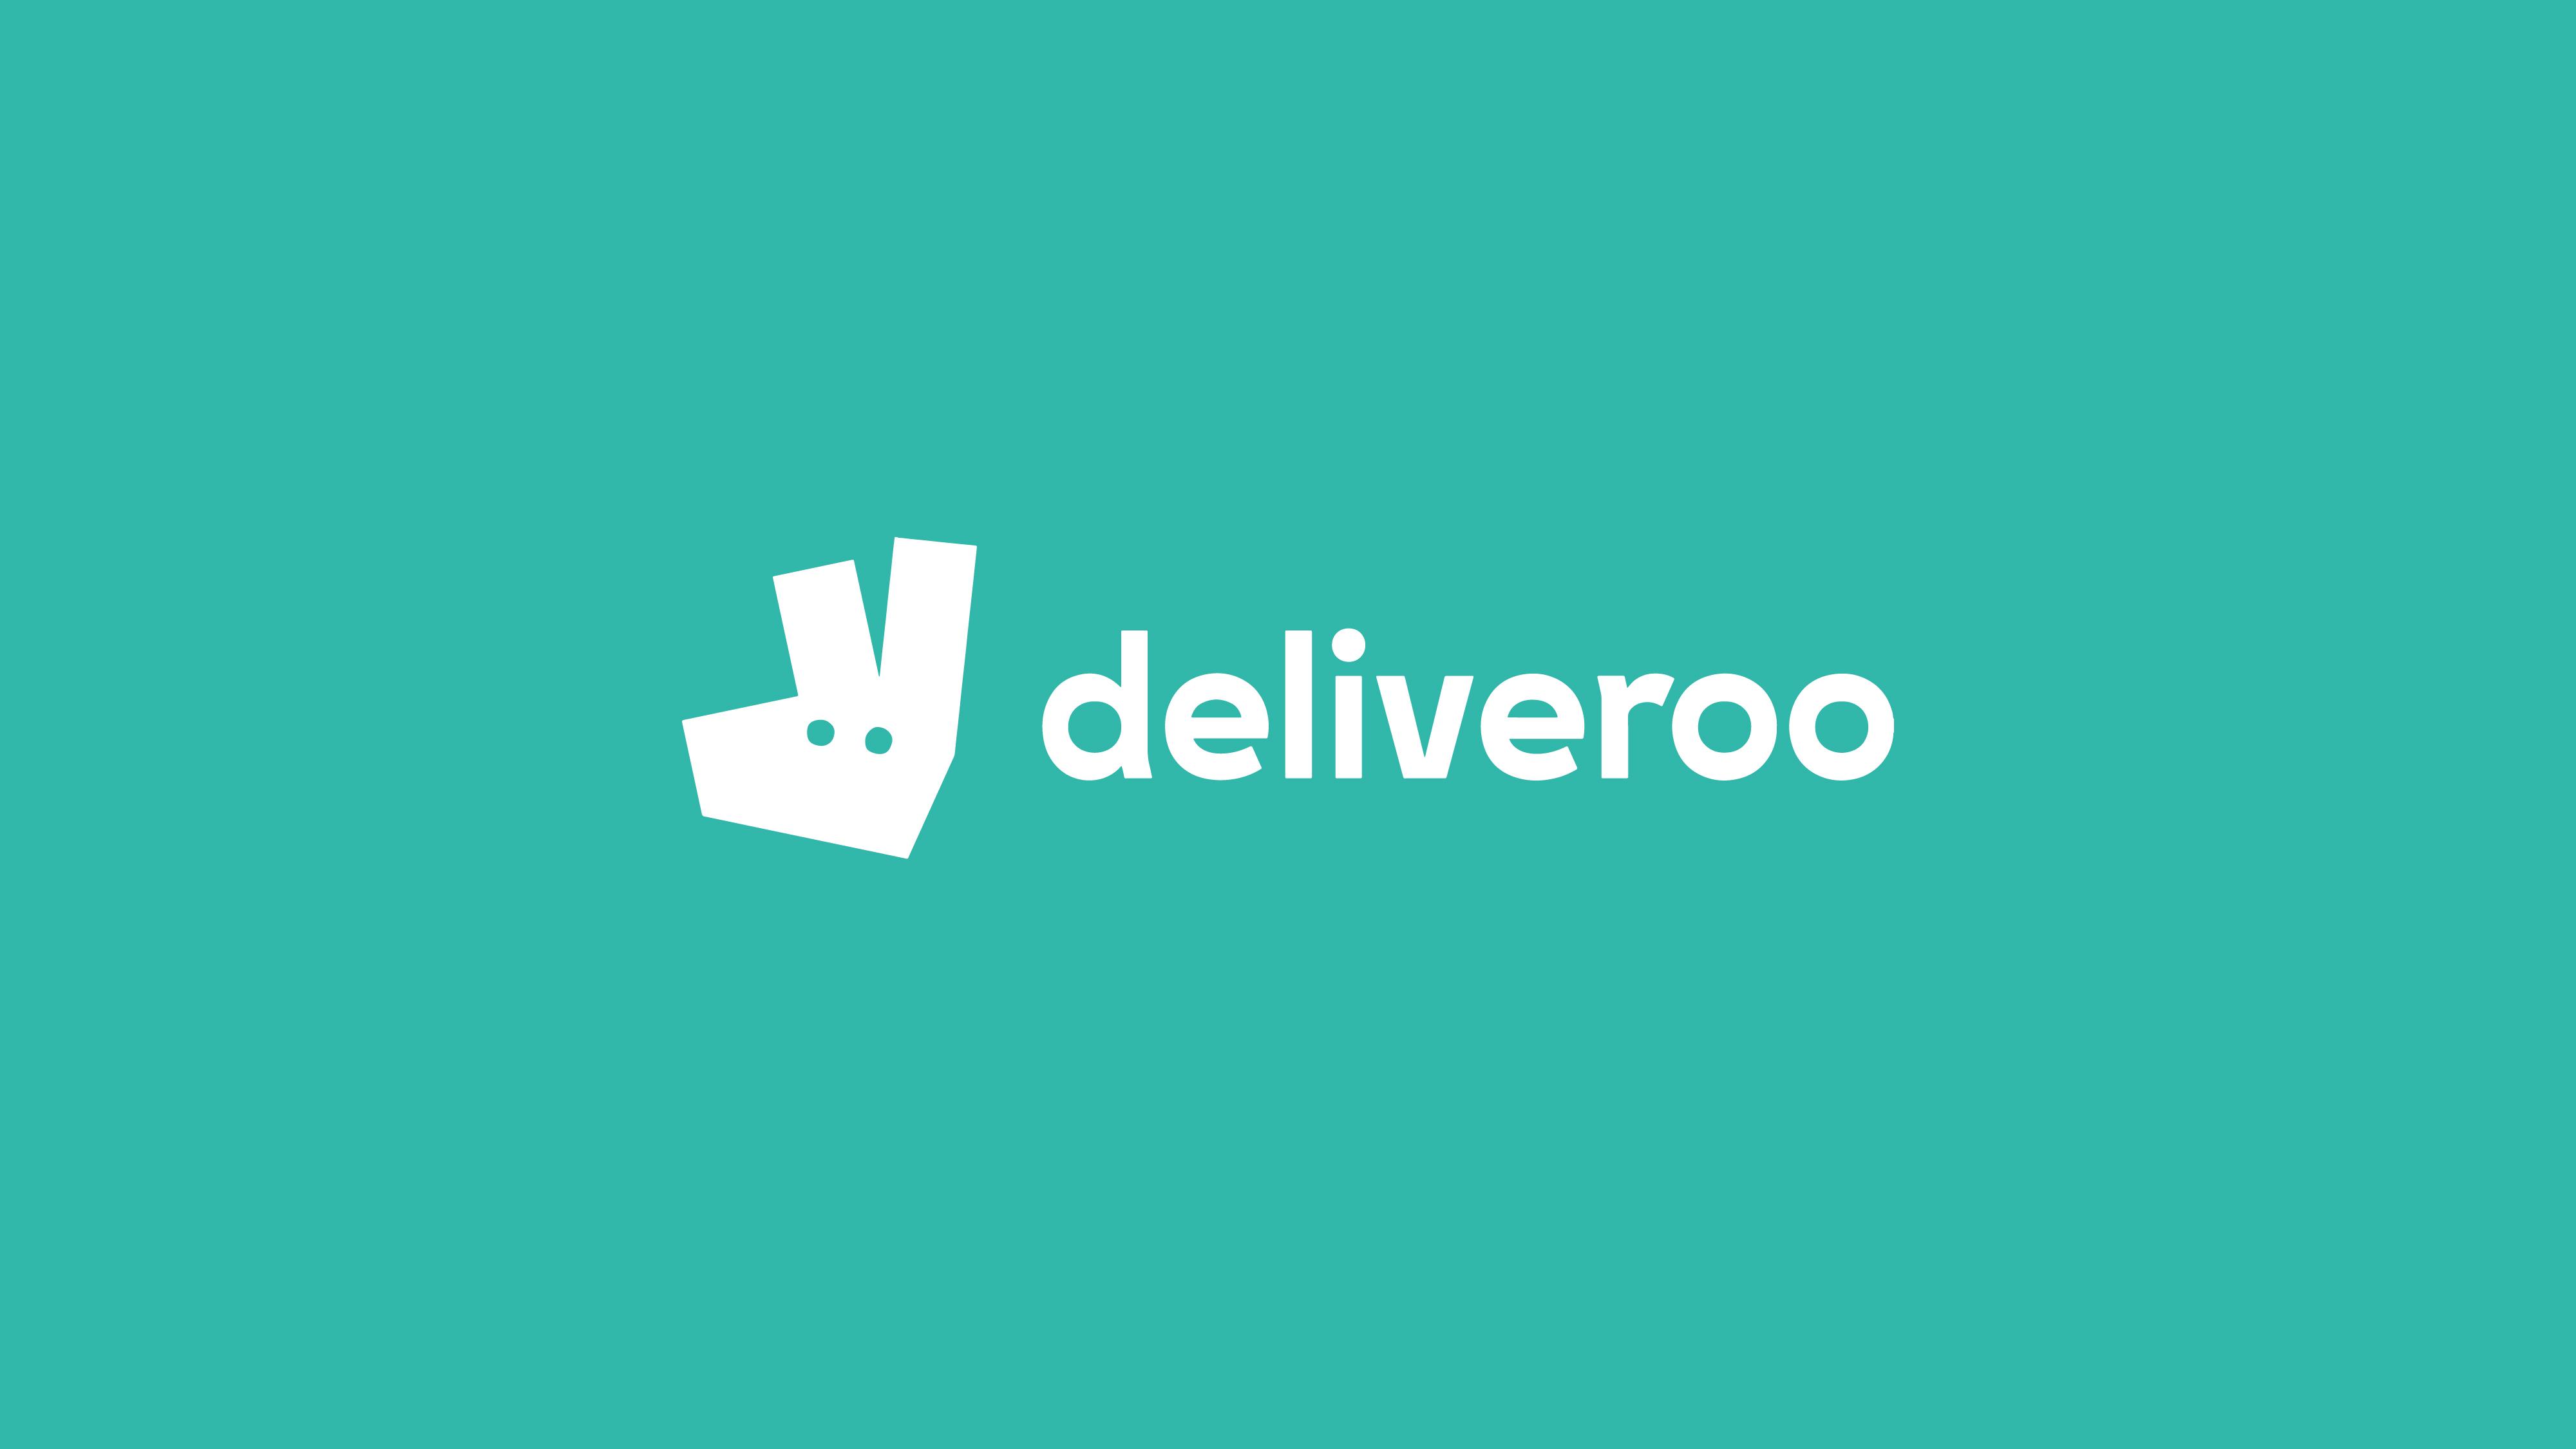 Deliveroo_logo_1920x1080px